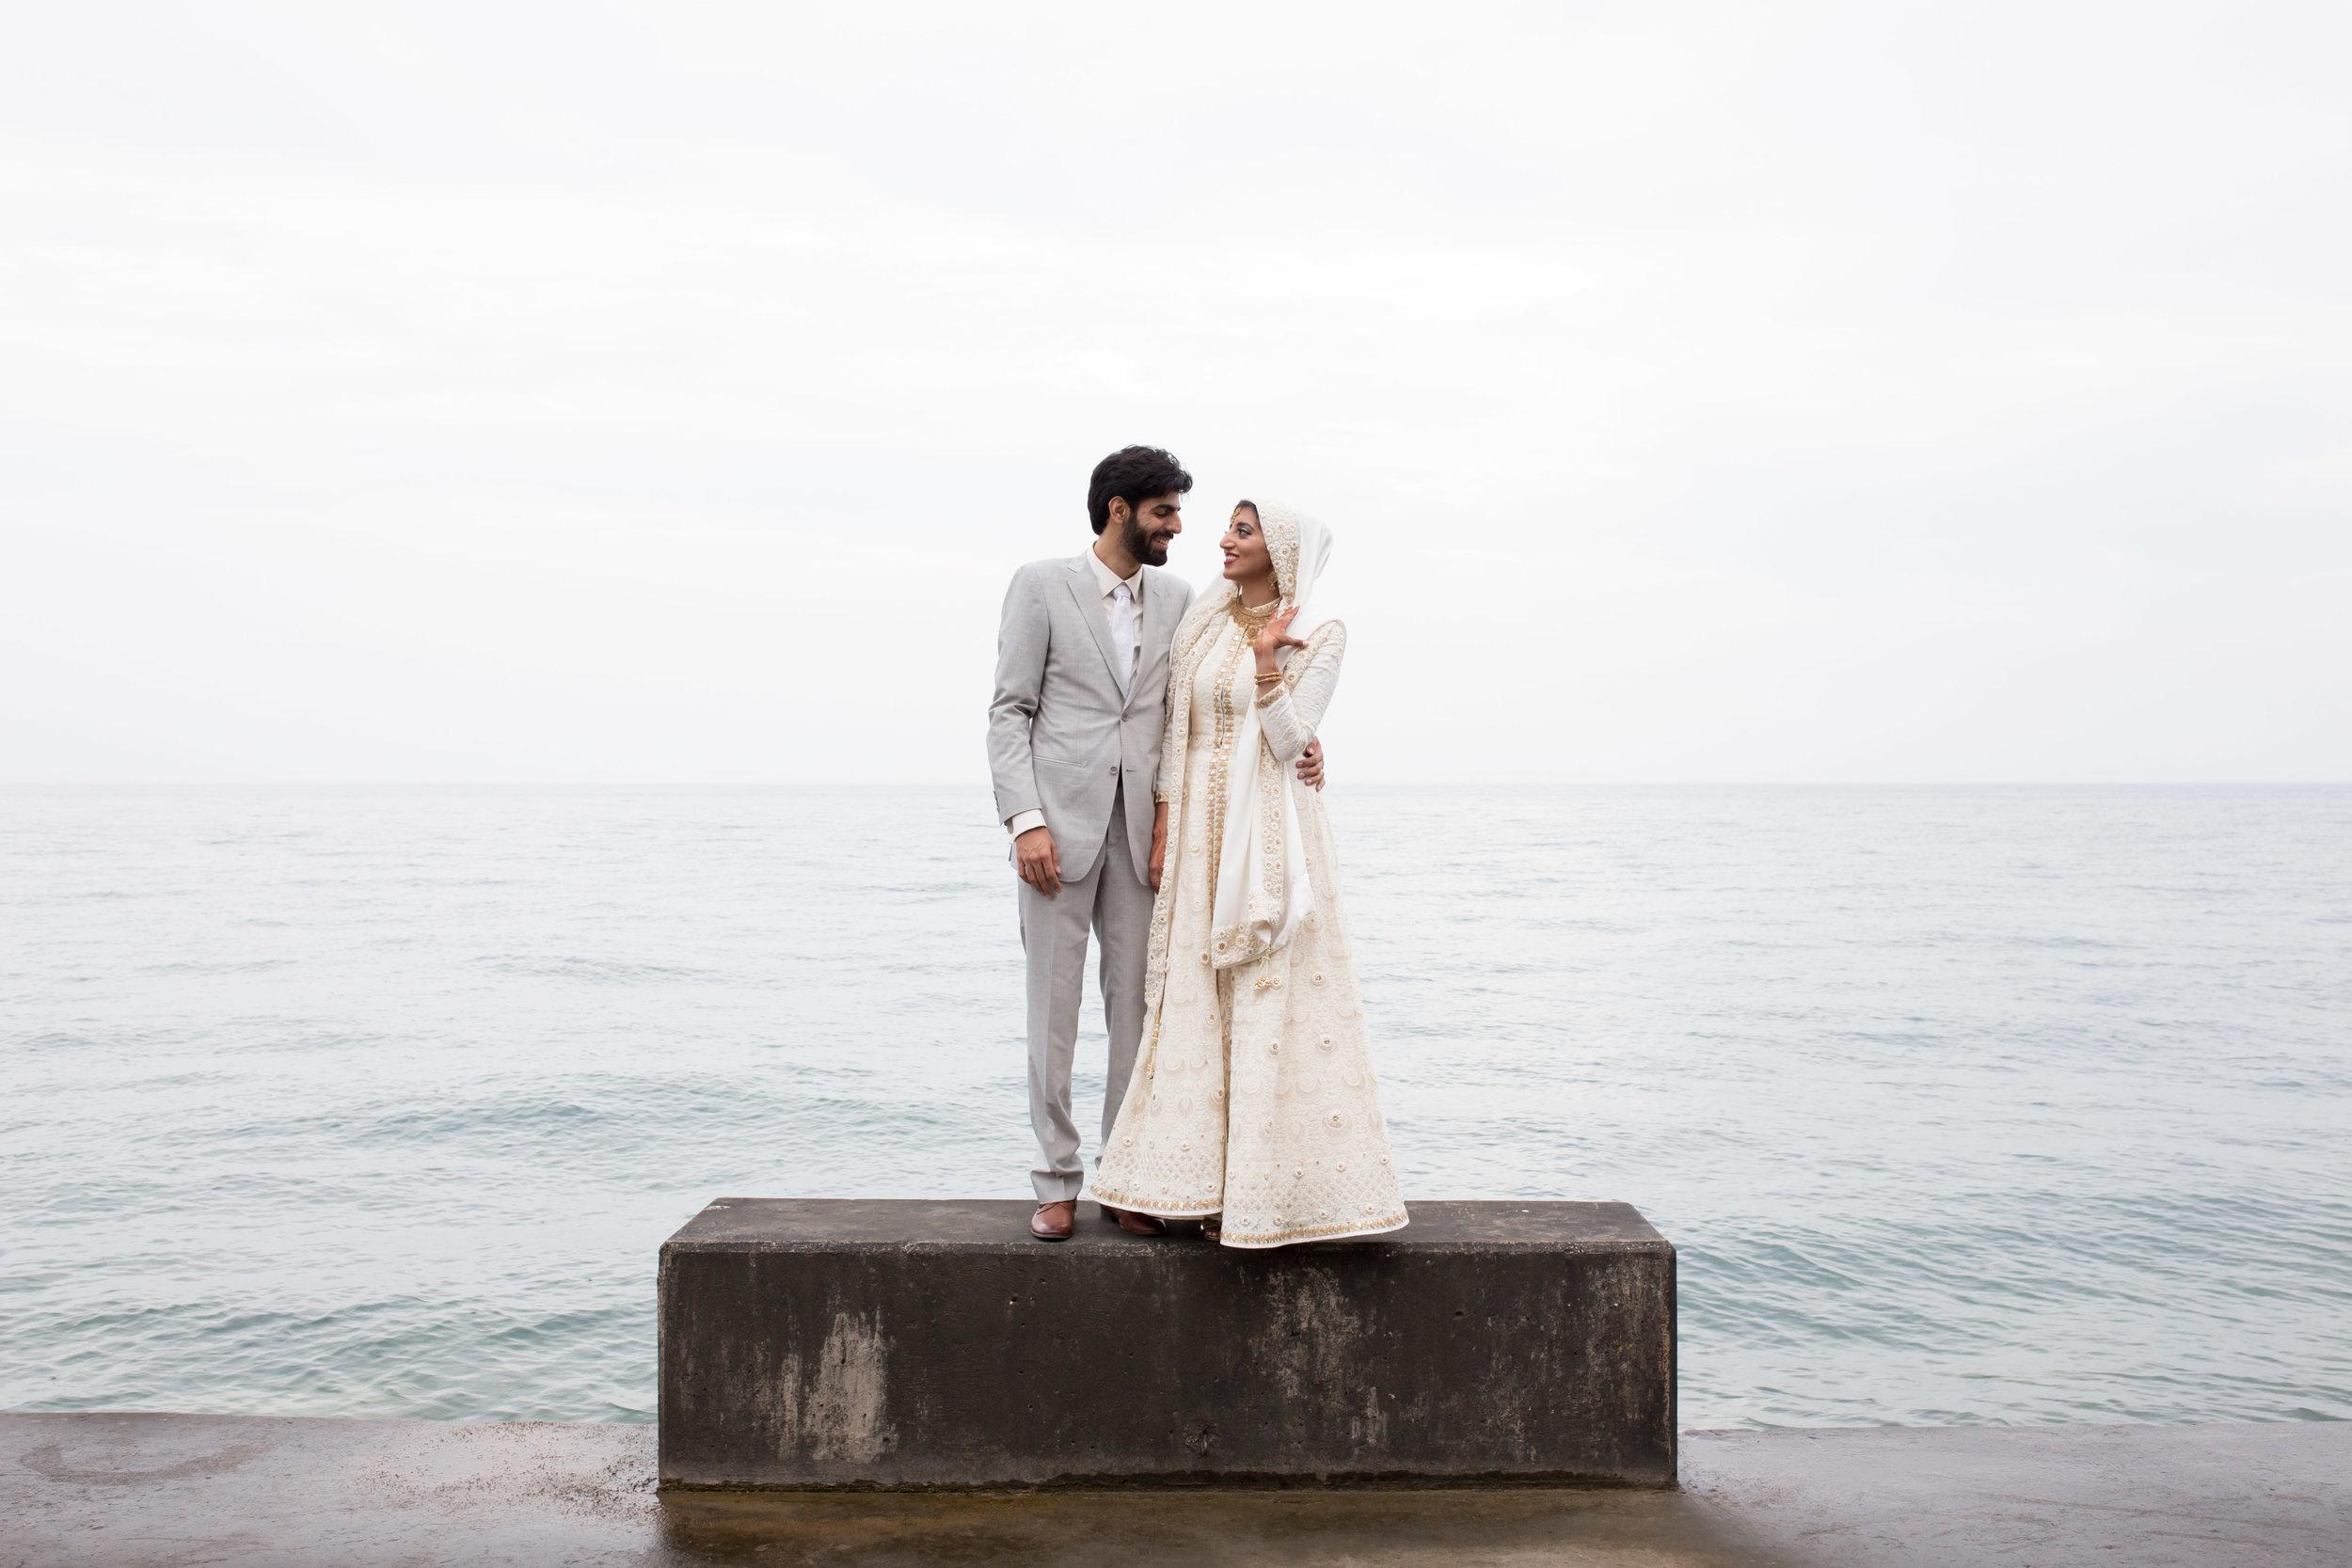 LisaDiederichPhotography_Maryam&Salman-141.jpg